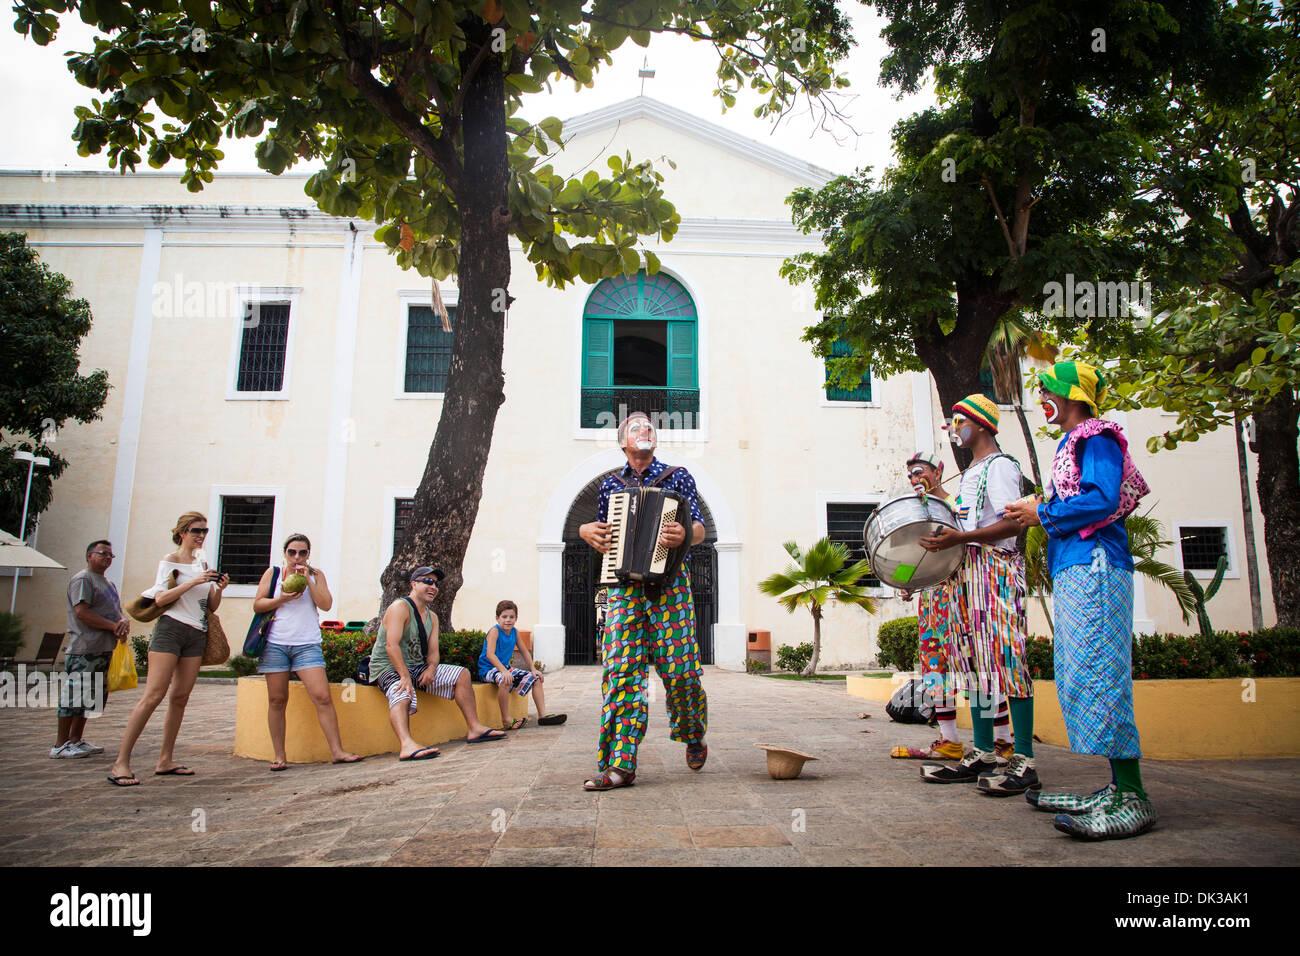 Scene from Centro de Turismo do Ceara, Fortaleza, Brazil. - Stock Image